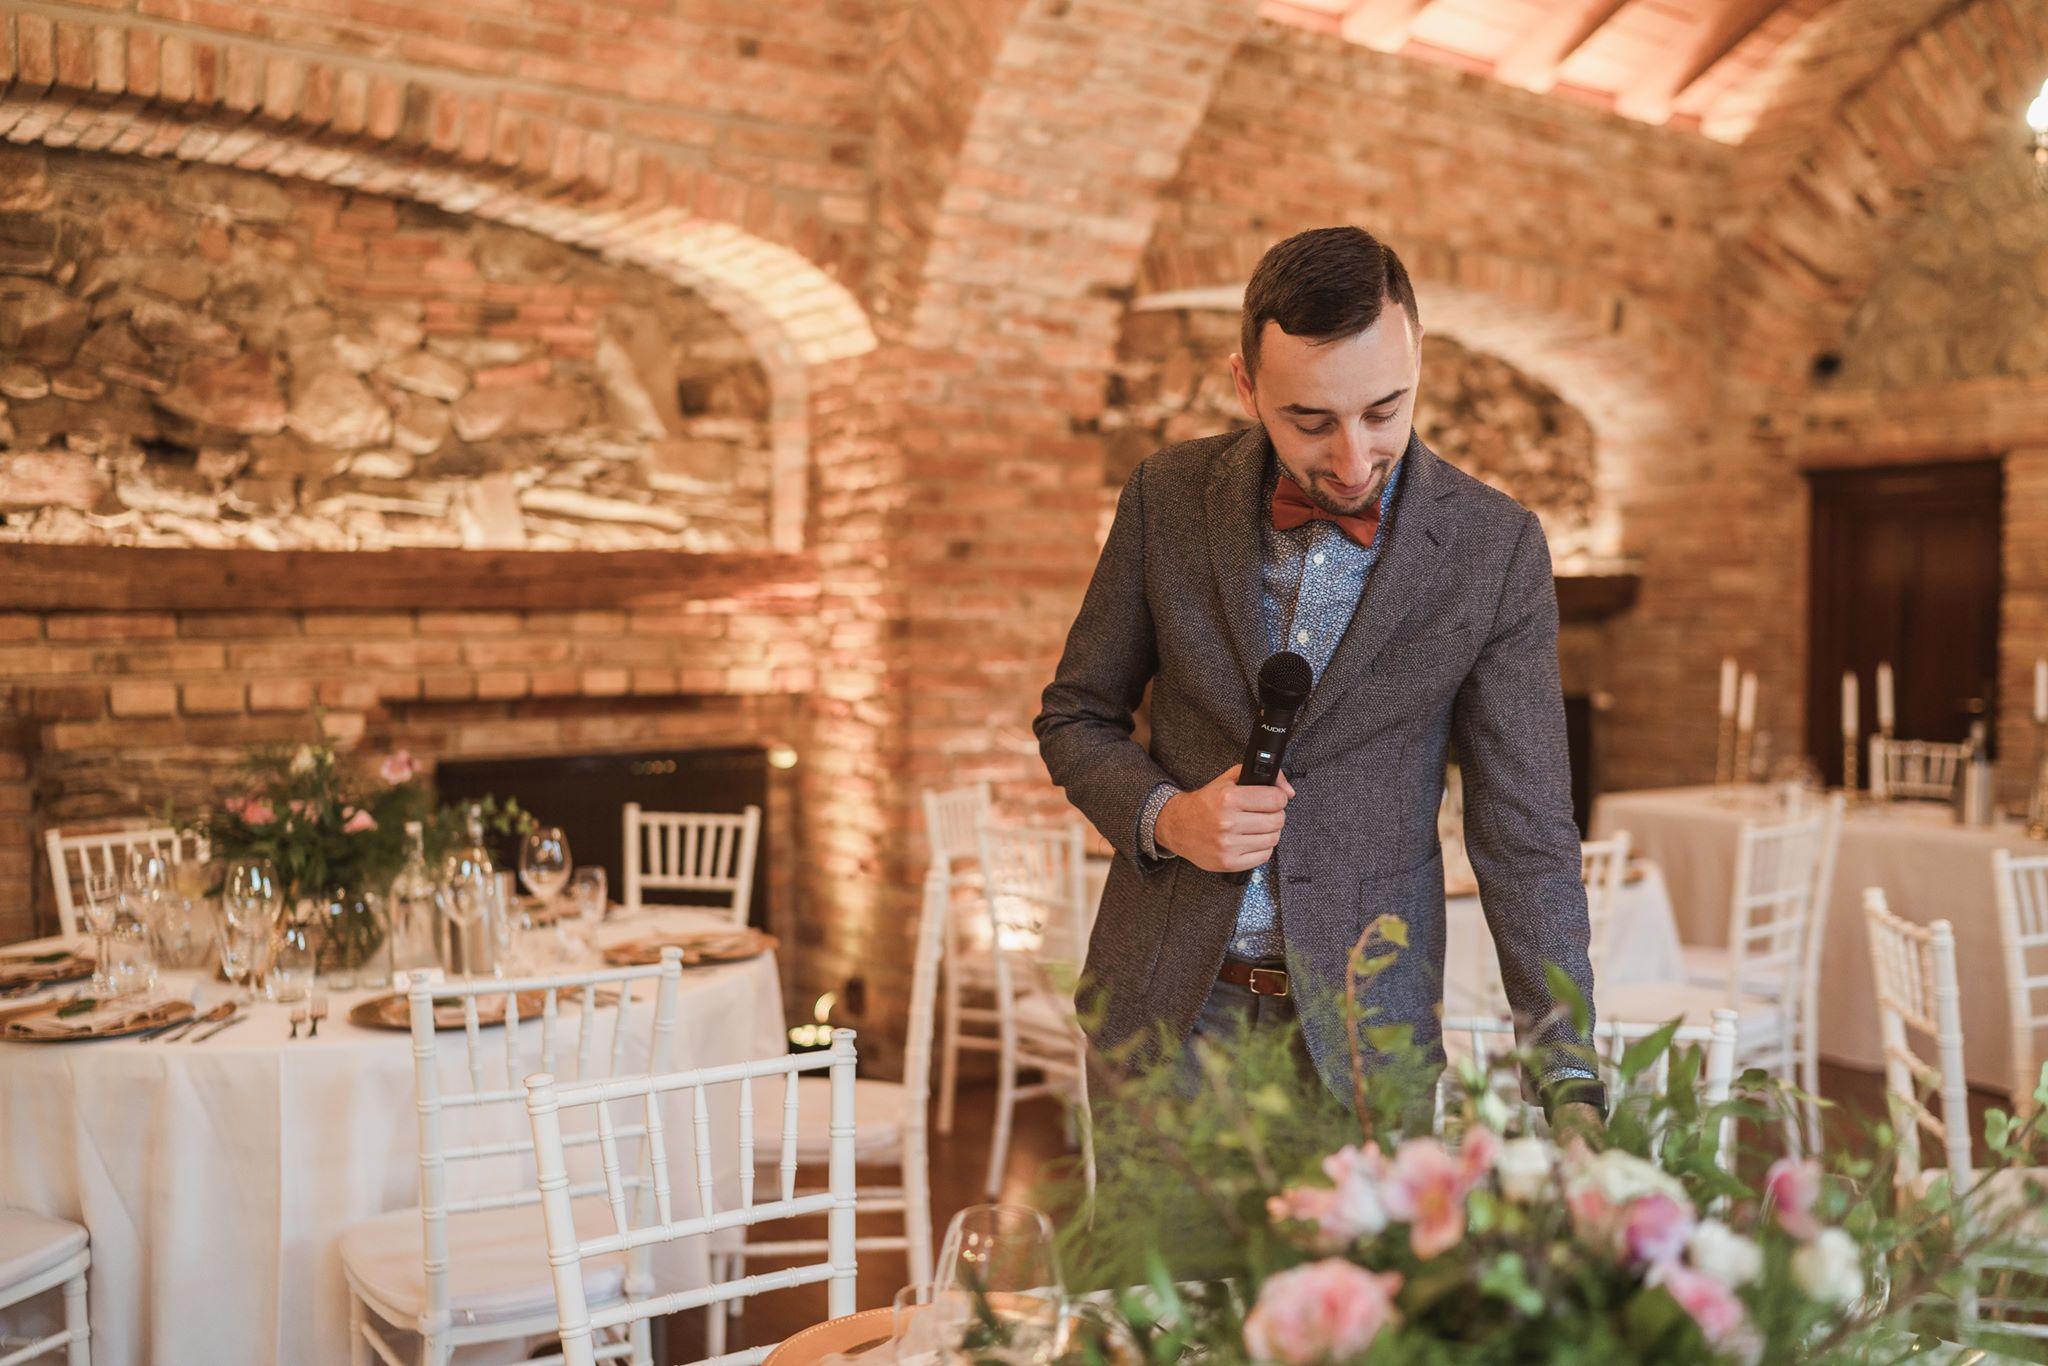 svadba-wedding-Neco-WineryEstate-DJ-Starejsi-Moderator-Skusenosti-Referencie-Modra-Wigerova-Villajpg